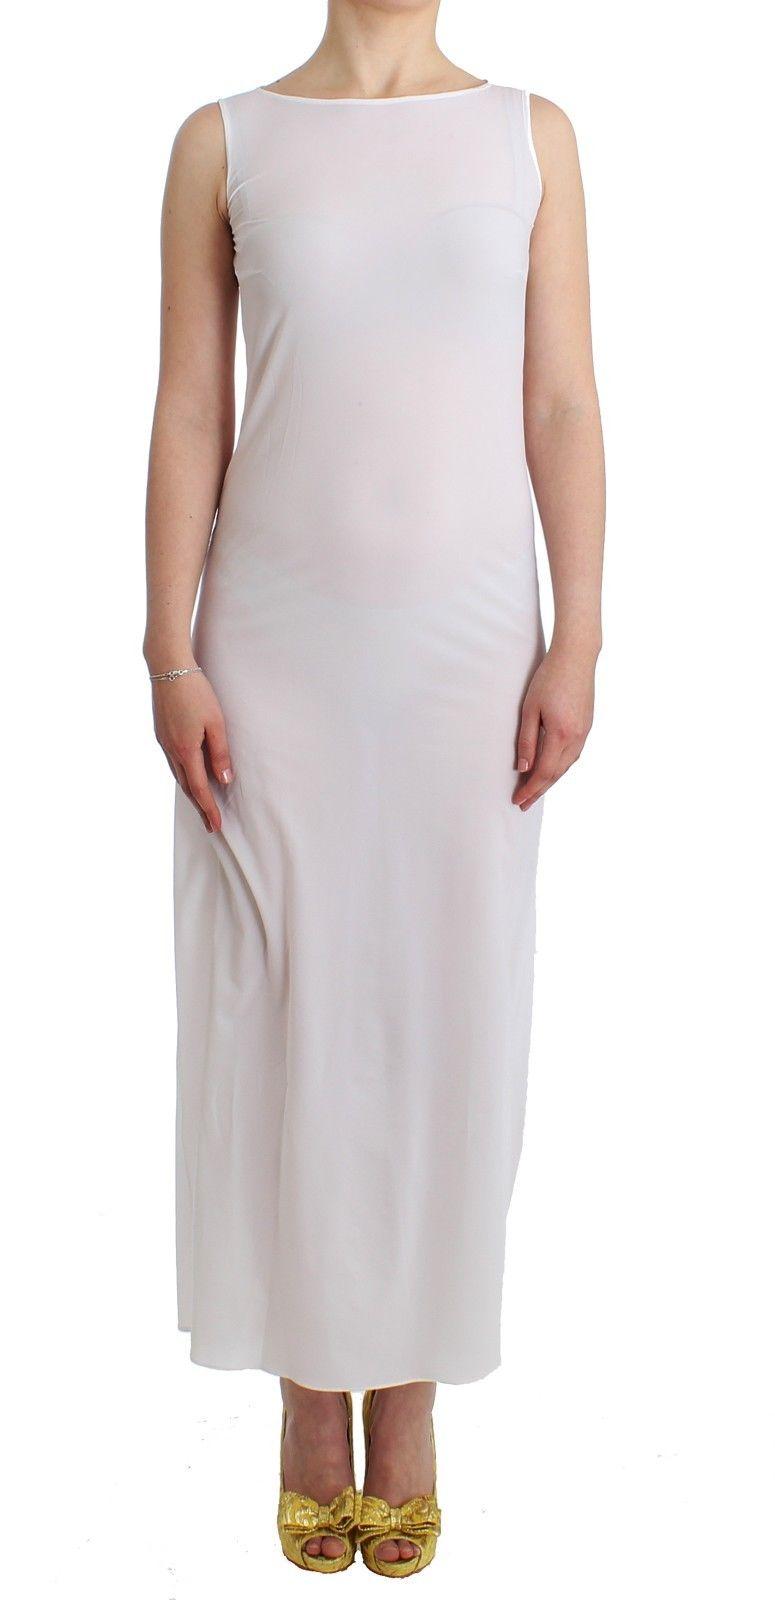 Ermanno Scervino Women's Maxi Dress Kaftan Full White SIG11511 - IT42 | S